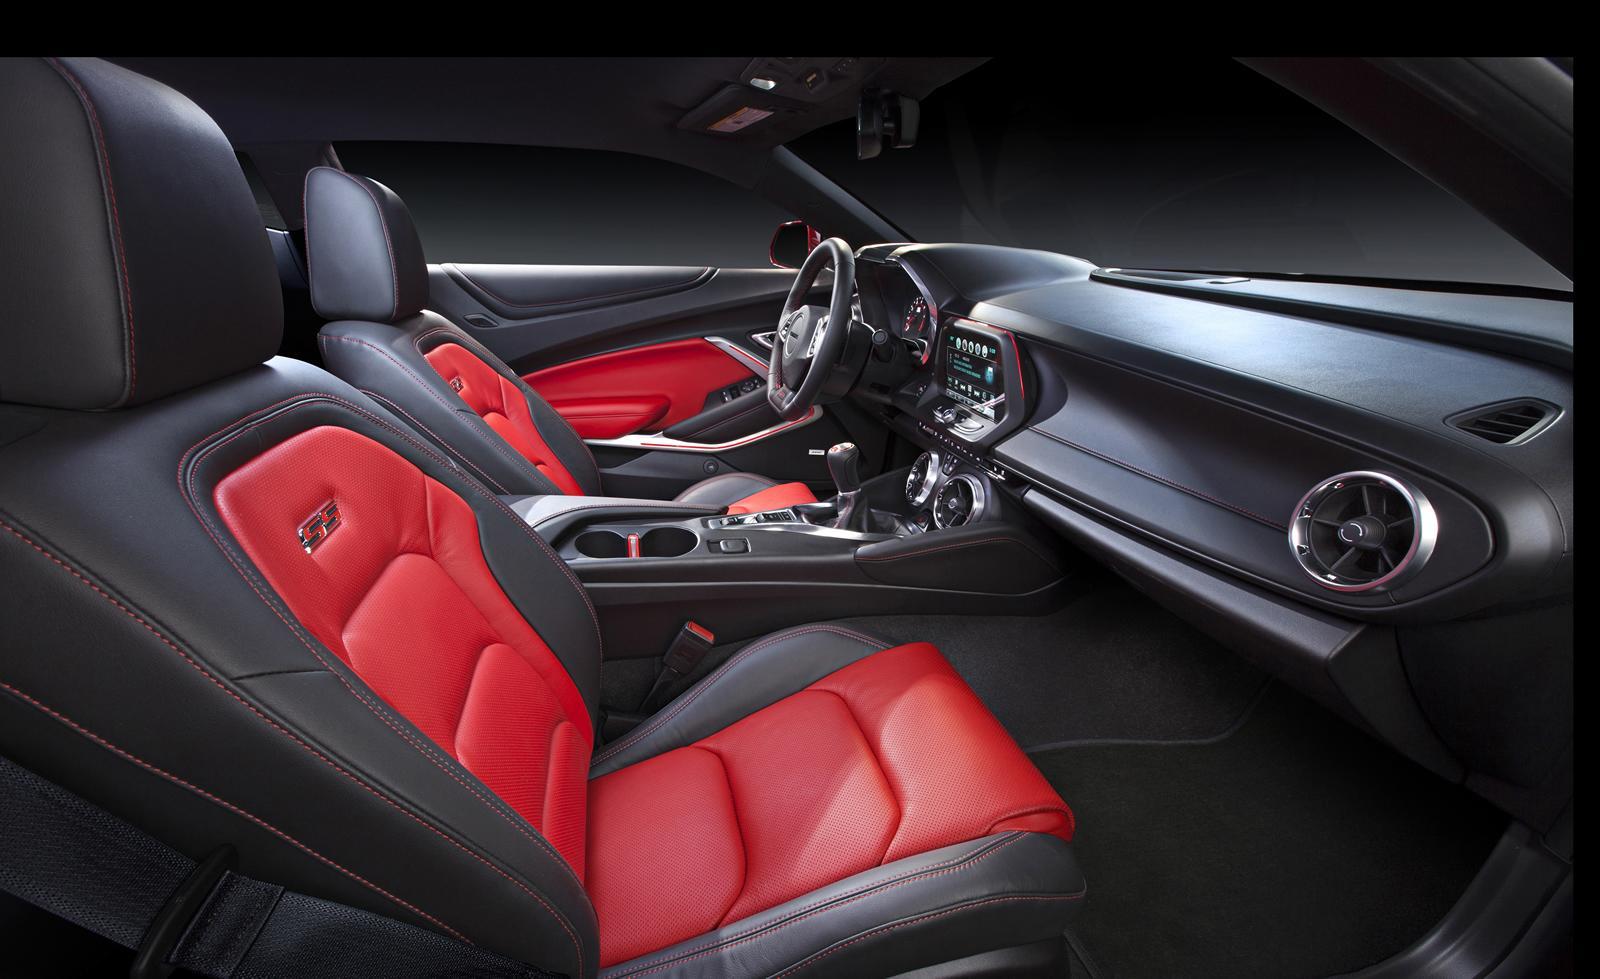 chevrolet cars news 2016 camaro unveiled offers 2 0l. Black Bedroom Furniture Sets. Home Design Ideas